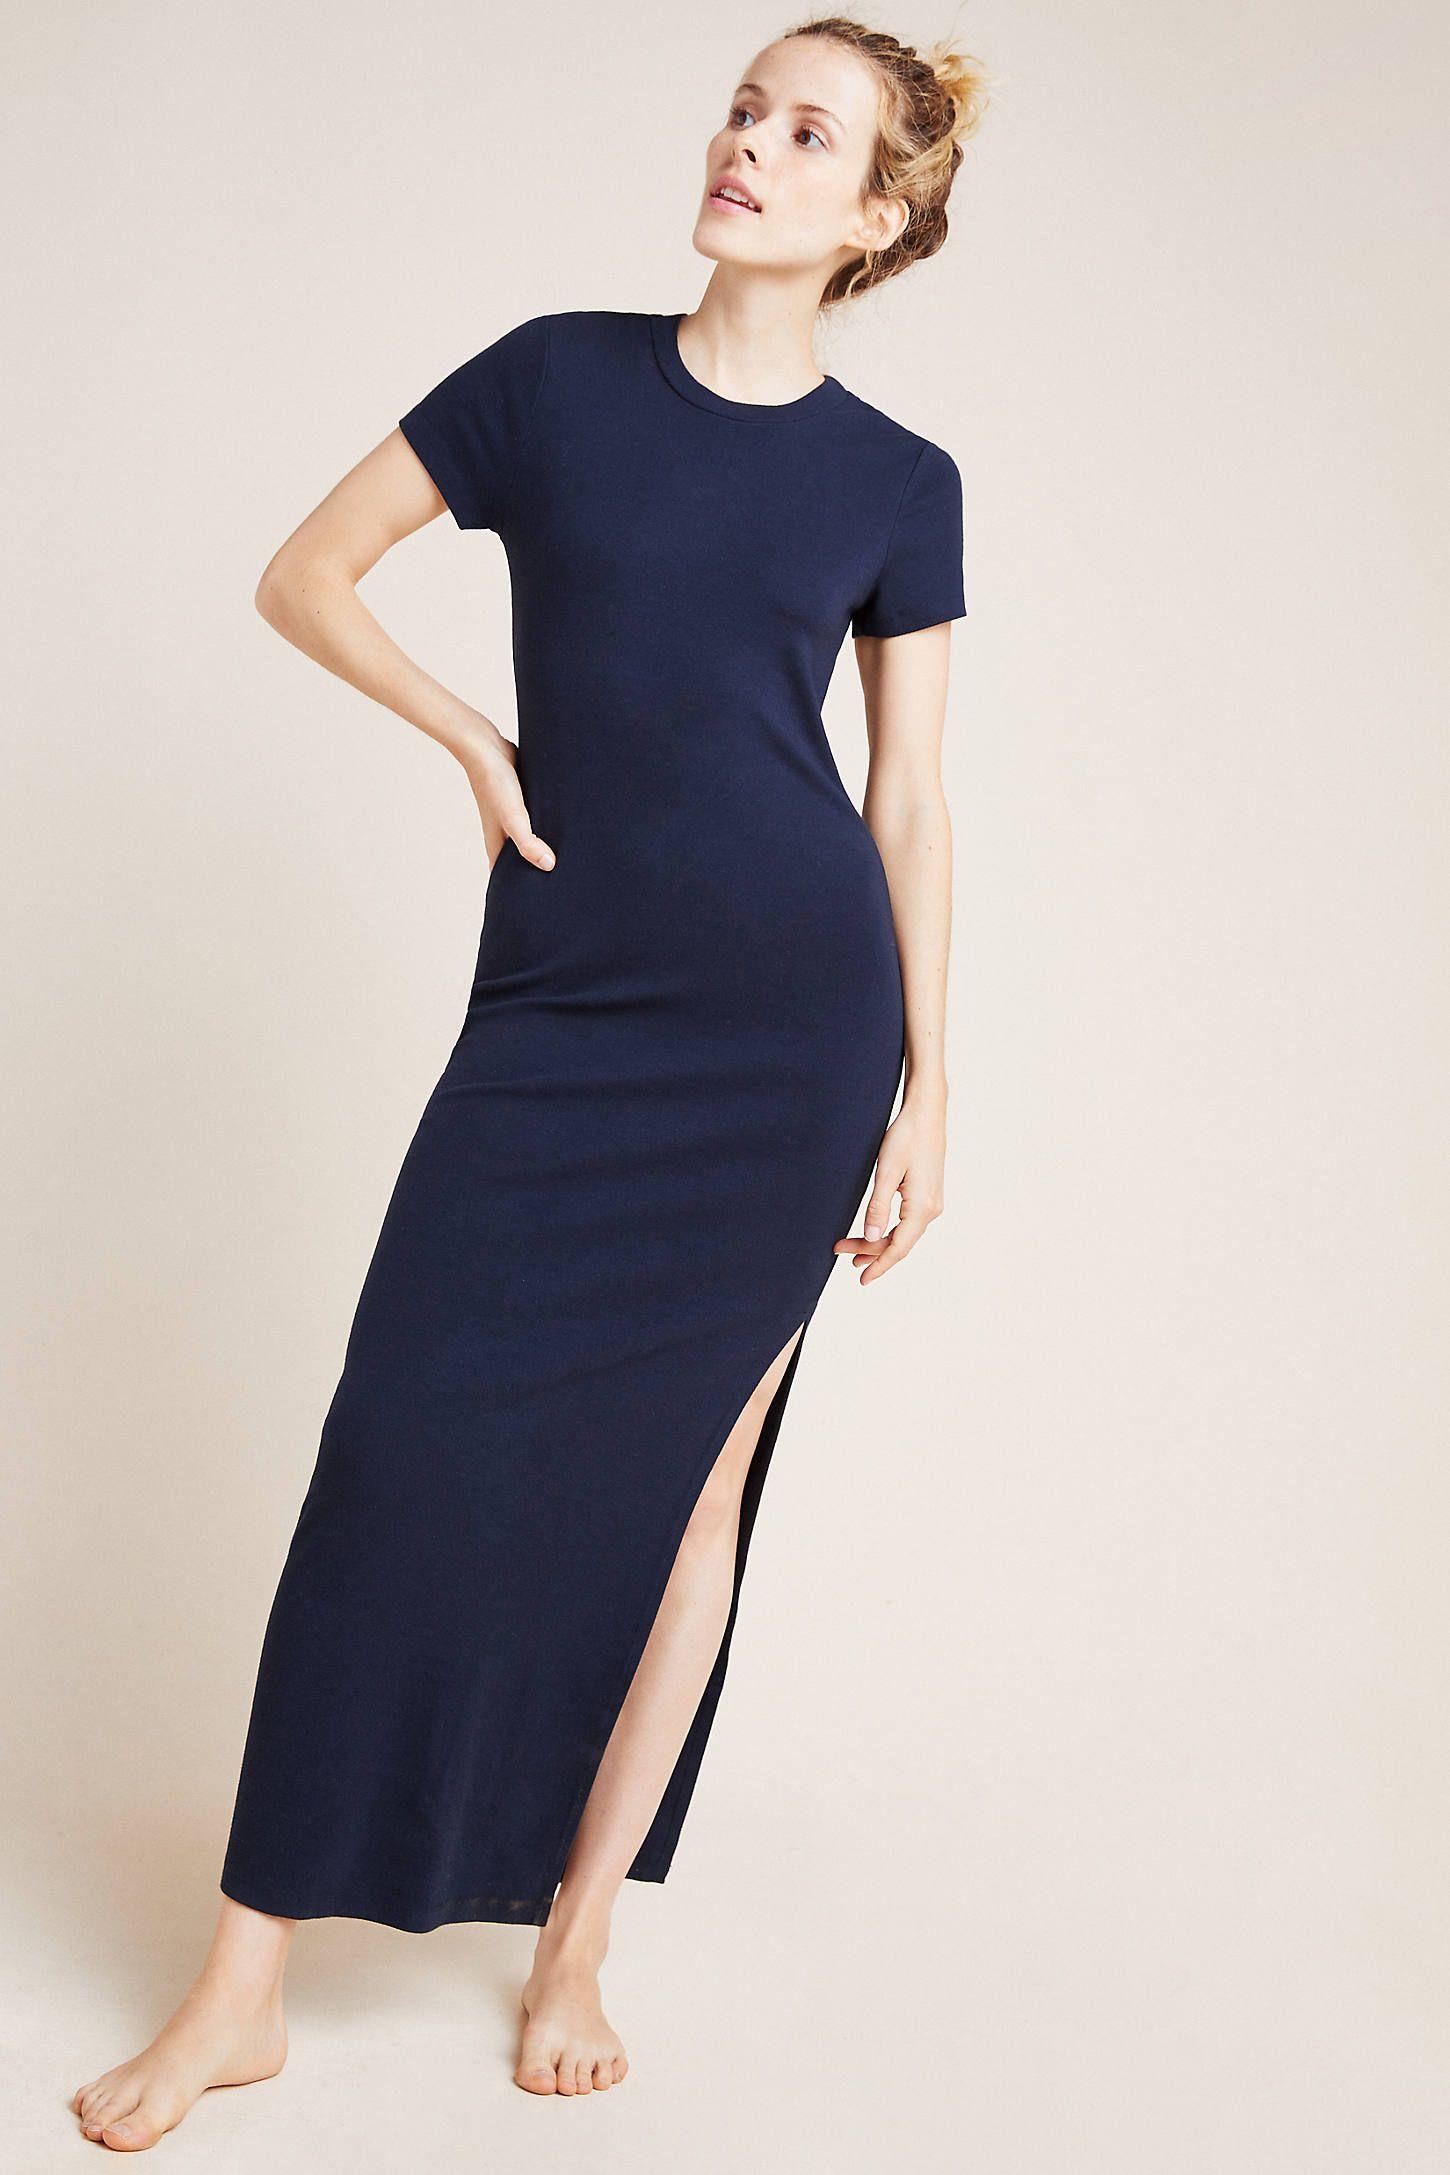 Stateside Alma Tee Dress